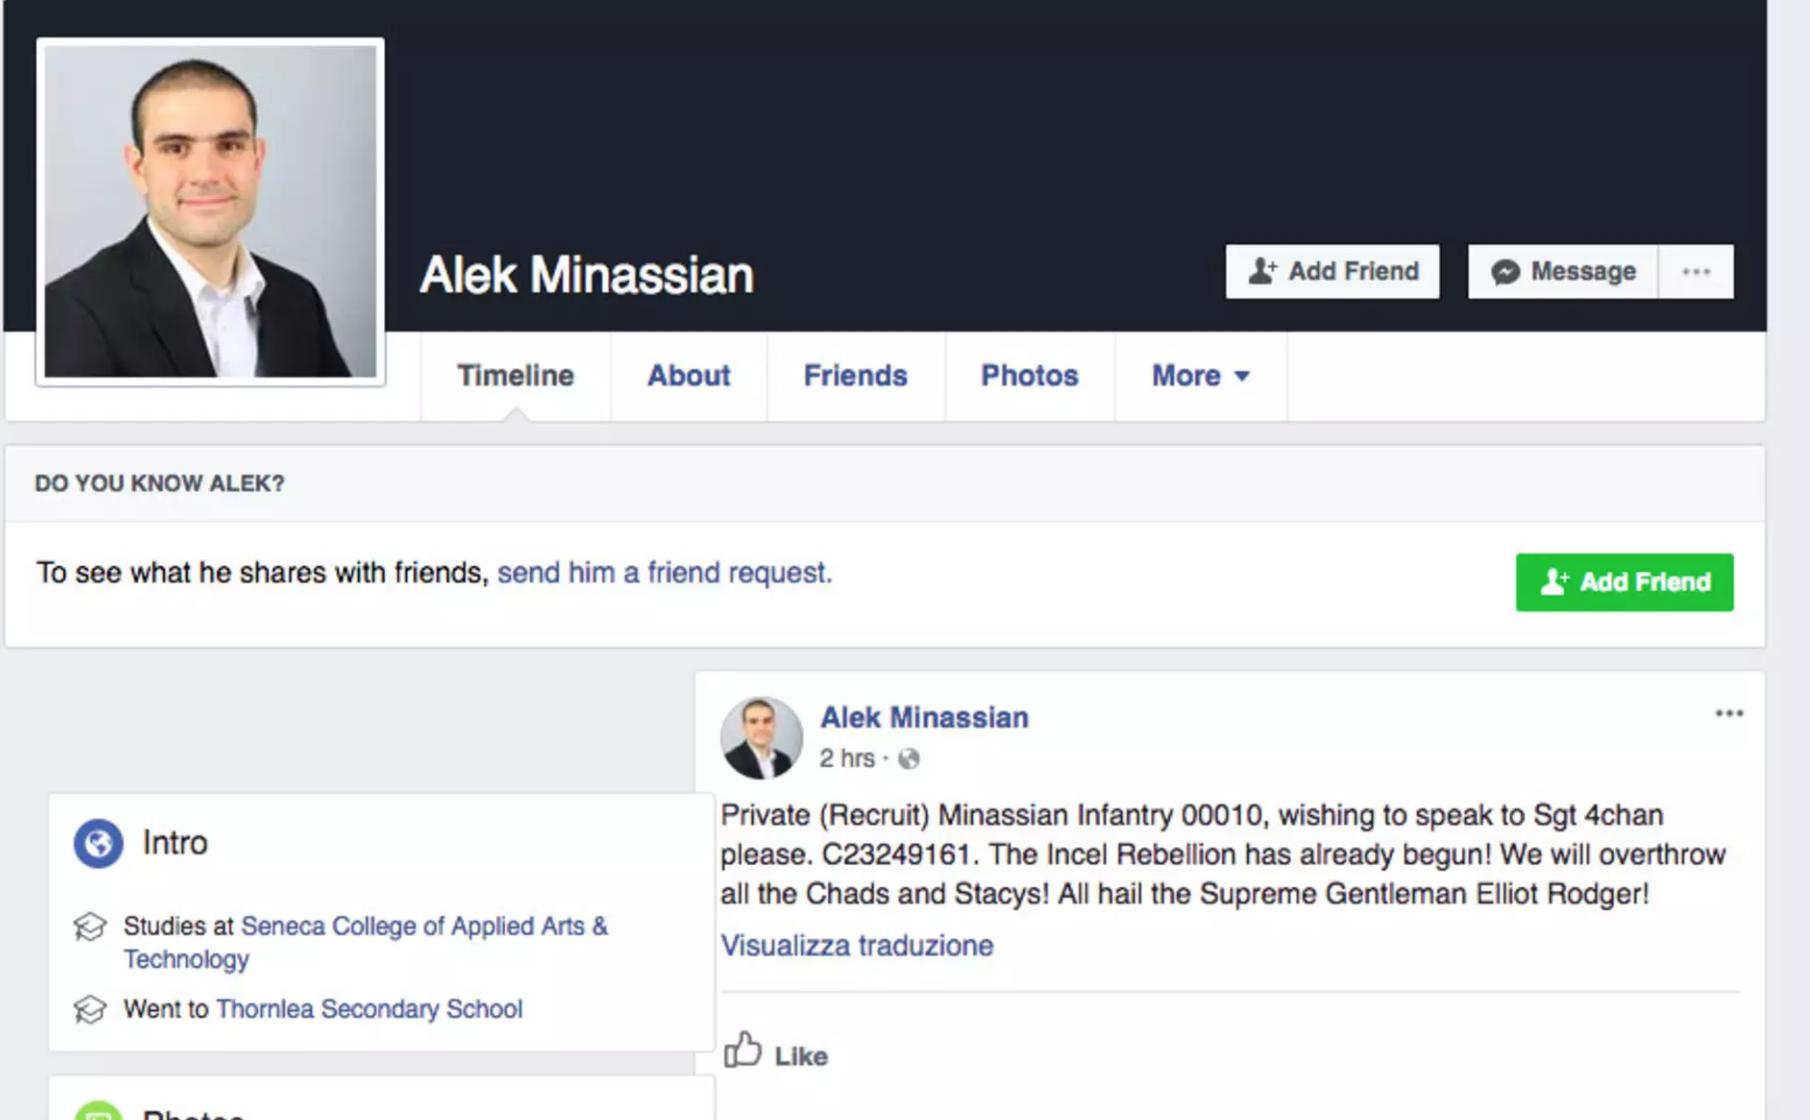 Alek Minassian's facebook post